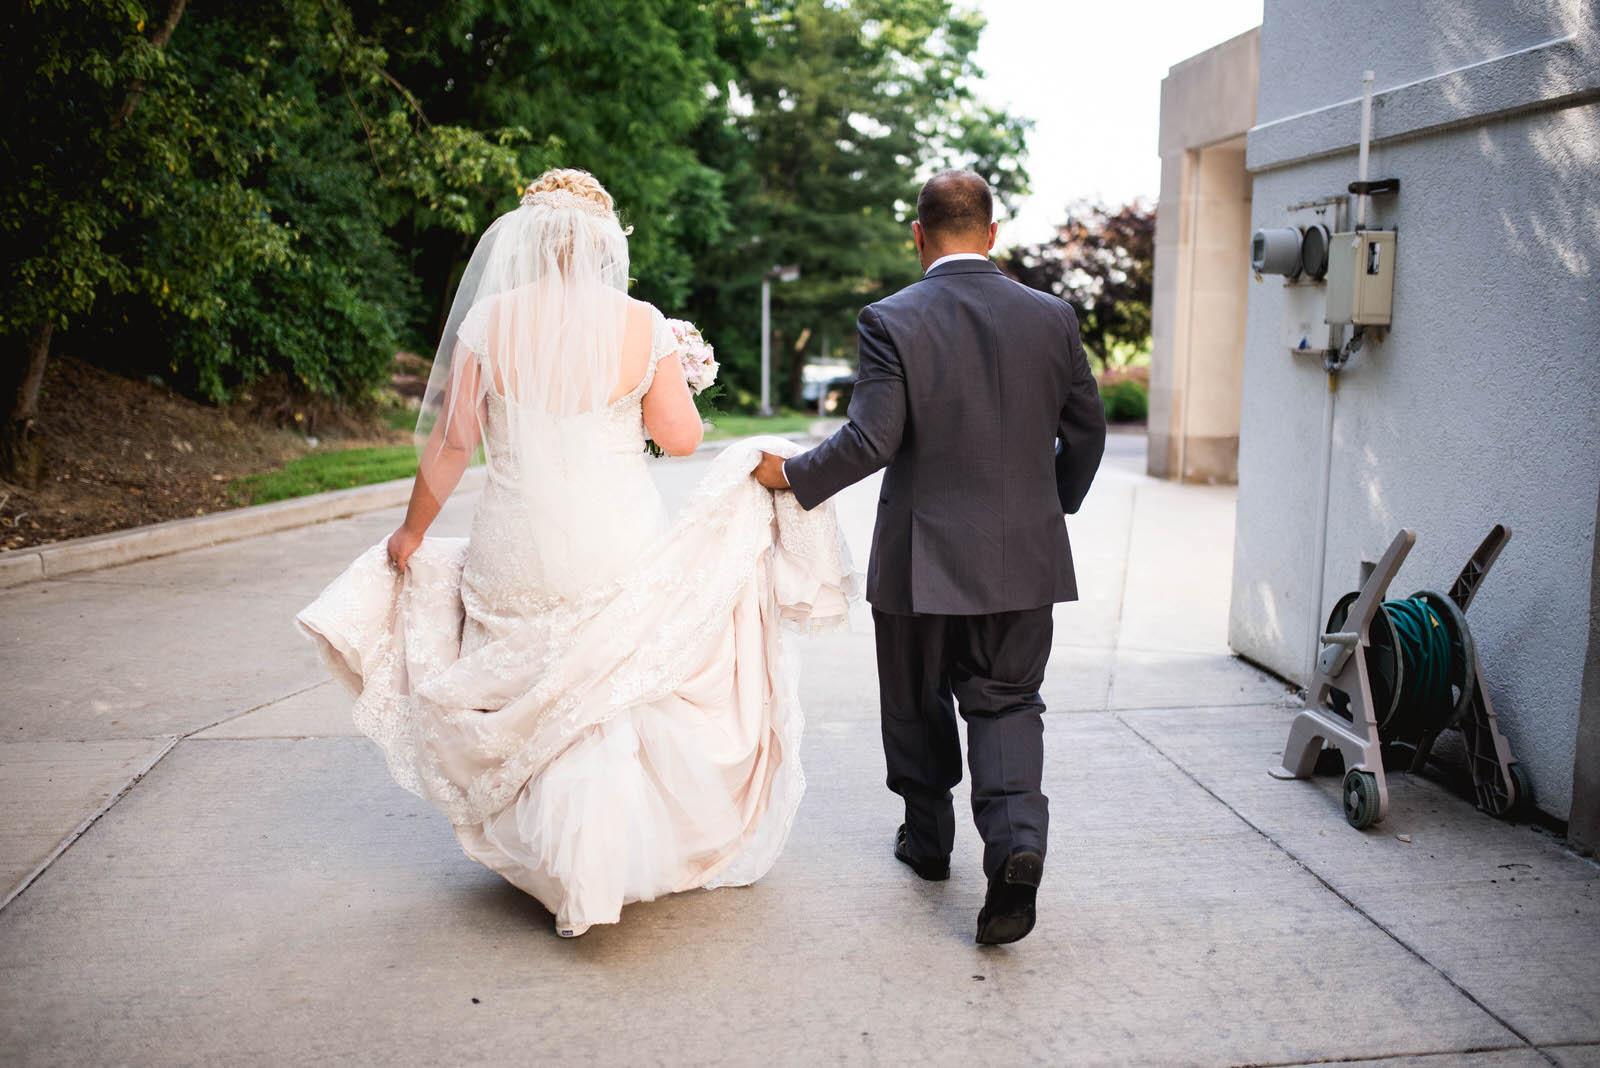 weddings-at-Holy-Cross-Greek-Orthodox-Church-and-Hall-54.jpg